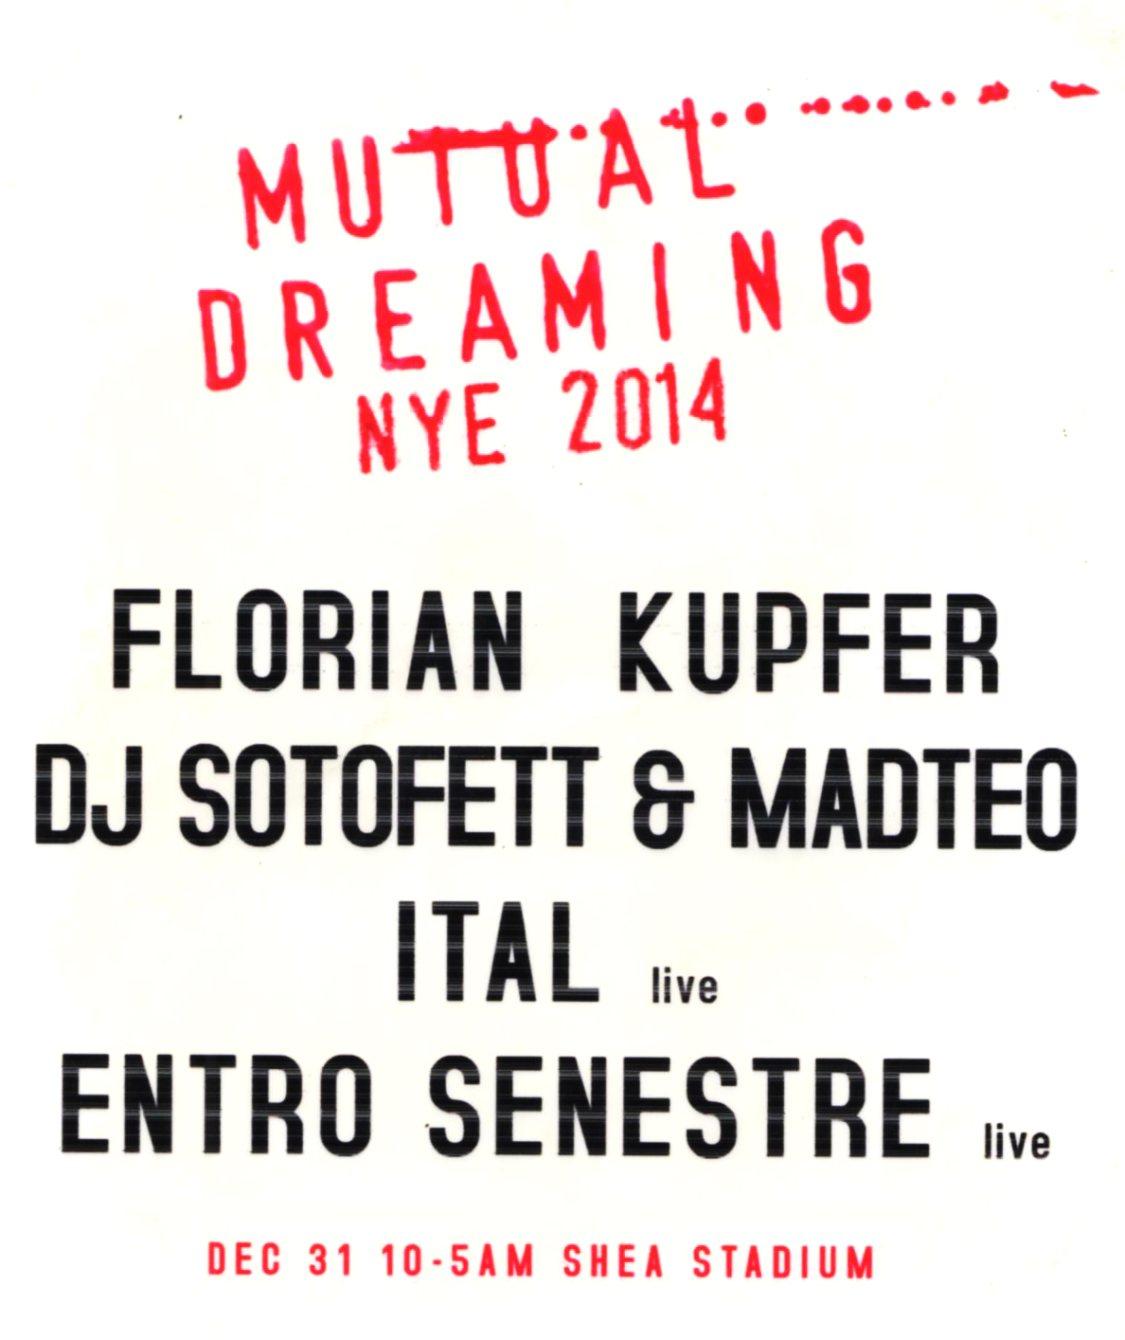 Mutual Dreaming NYE: DJ Sotofett & Madteo, Florian Kupfer, Ital, Entro Senestre, Florian Kupfer  New Years 2014